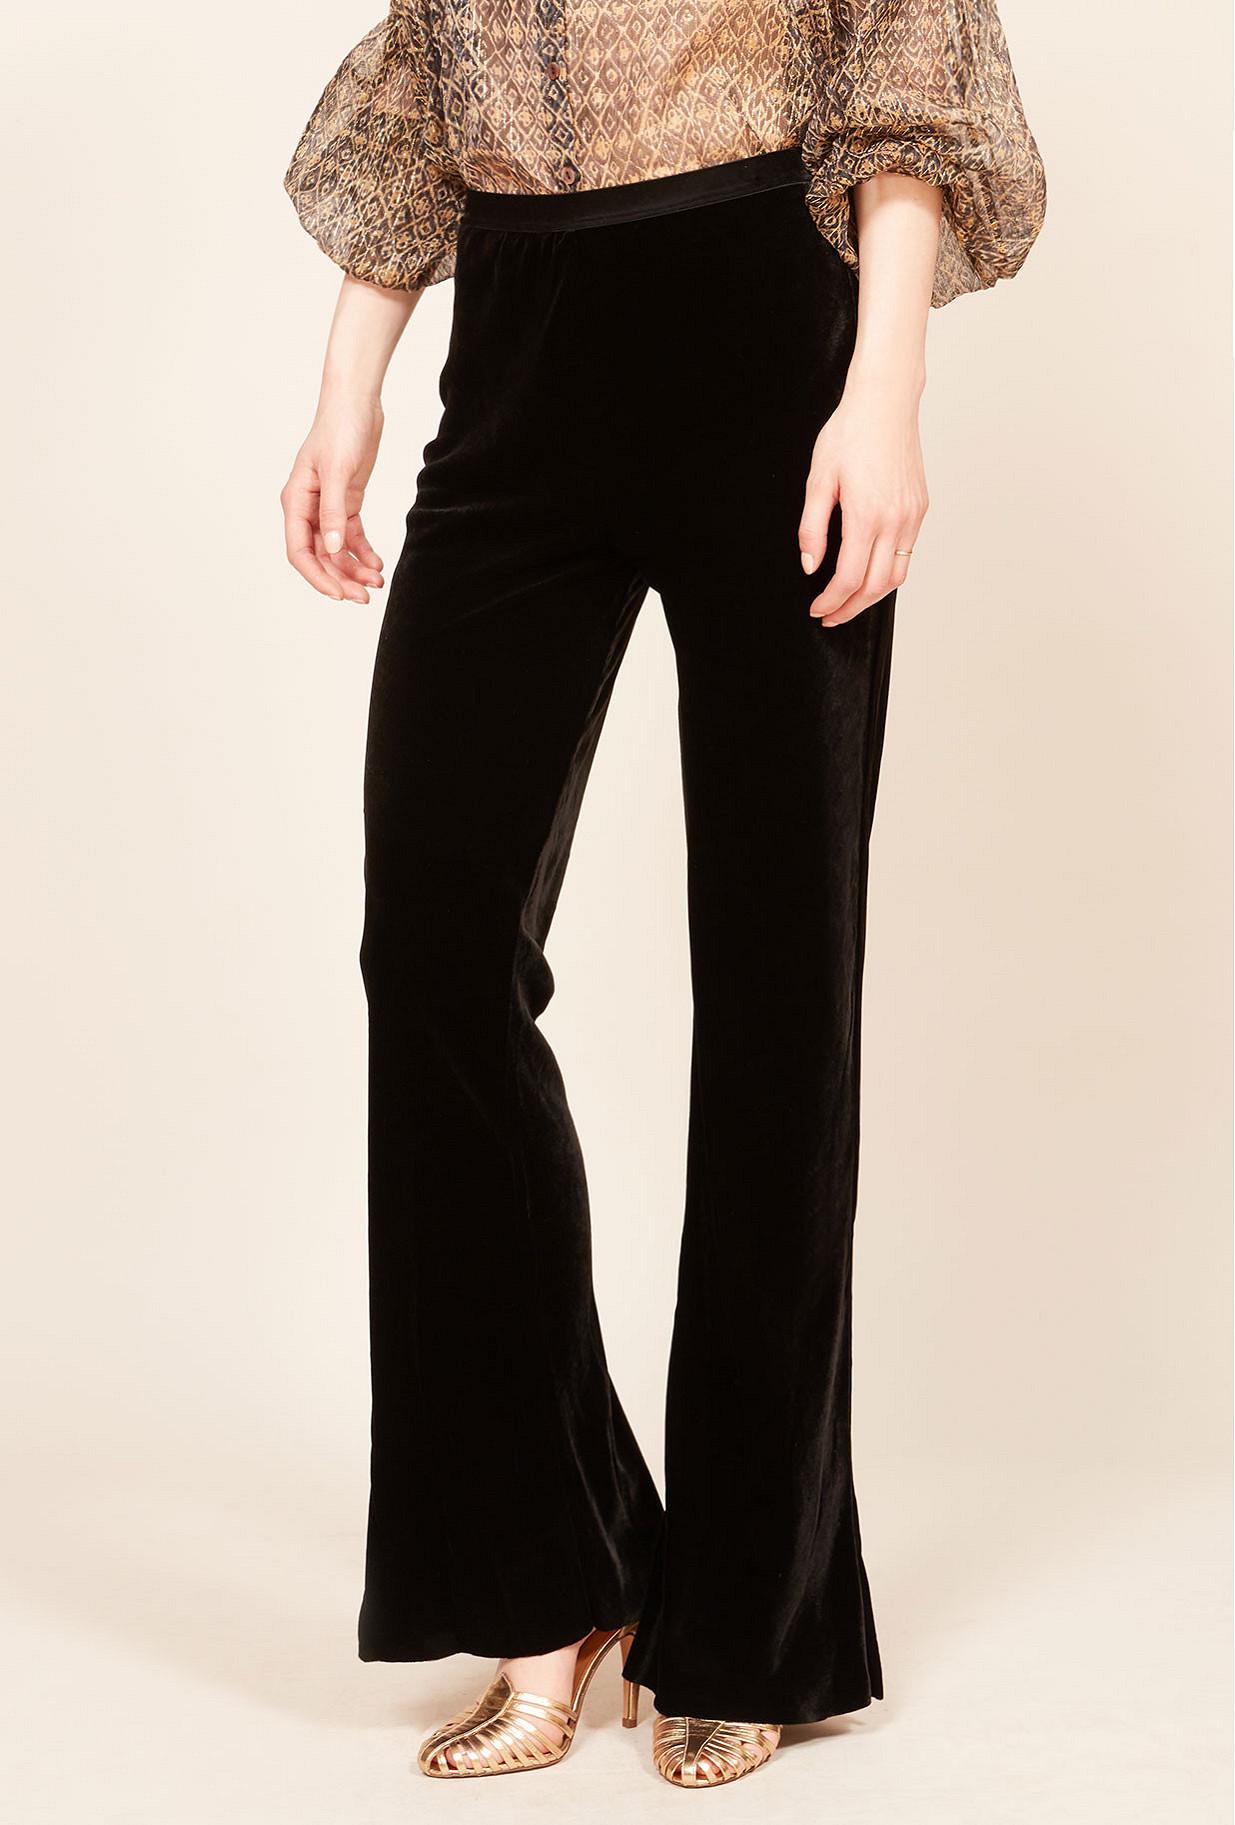 Black pant Monae